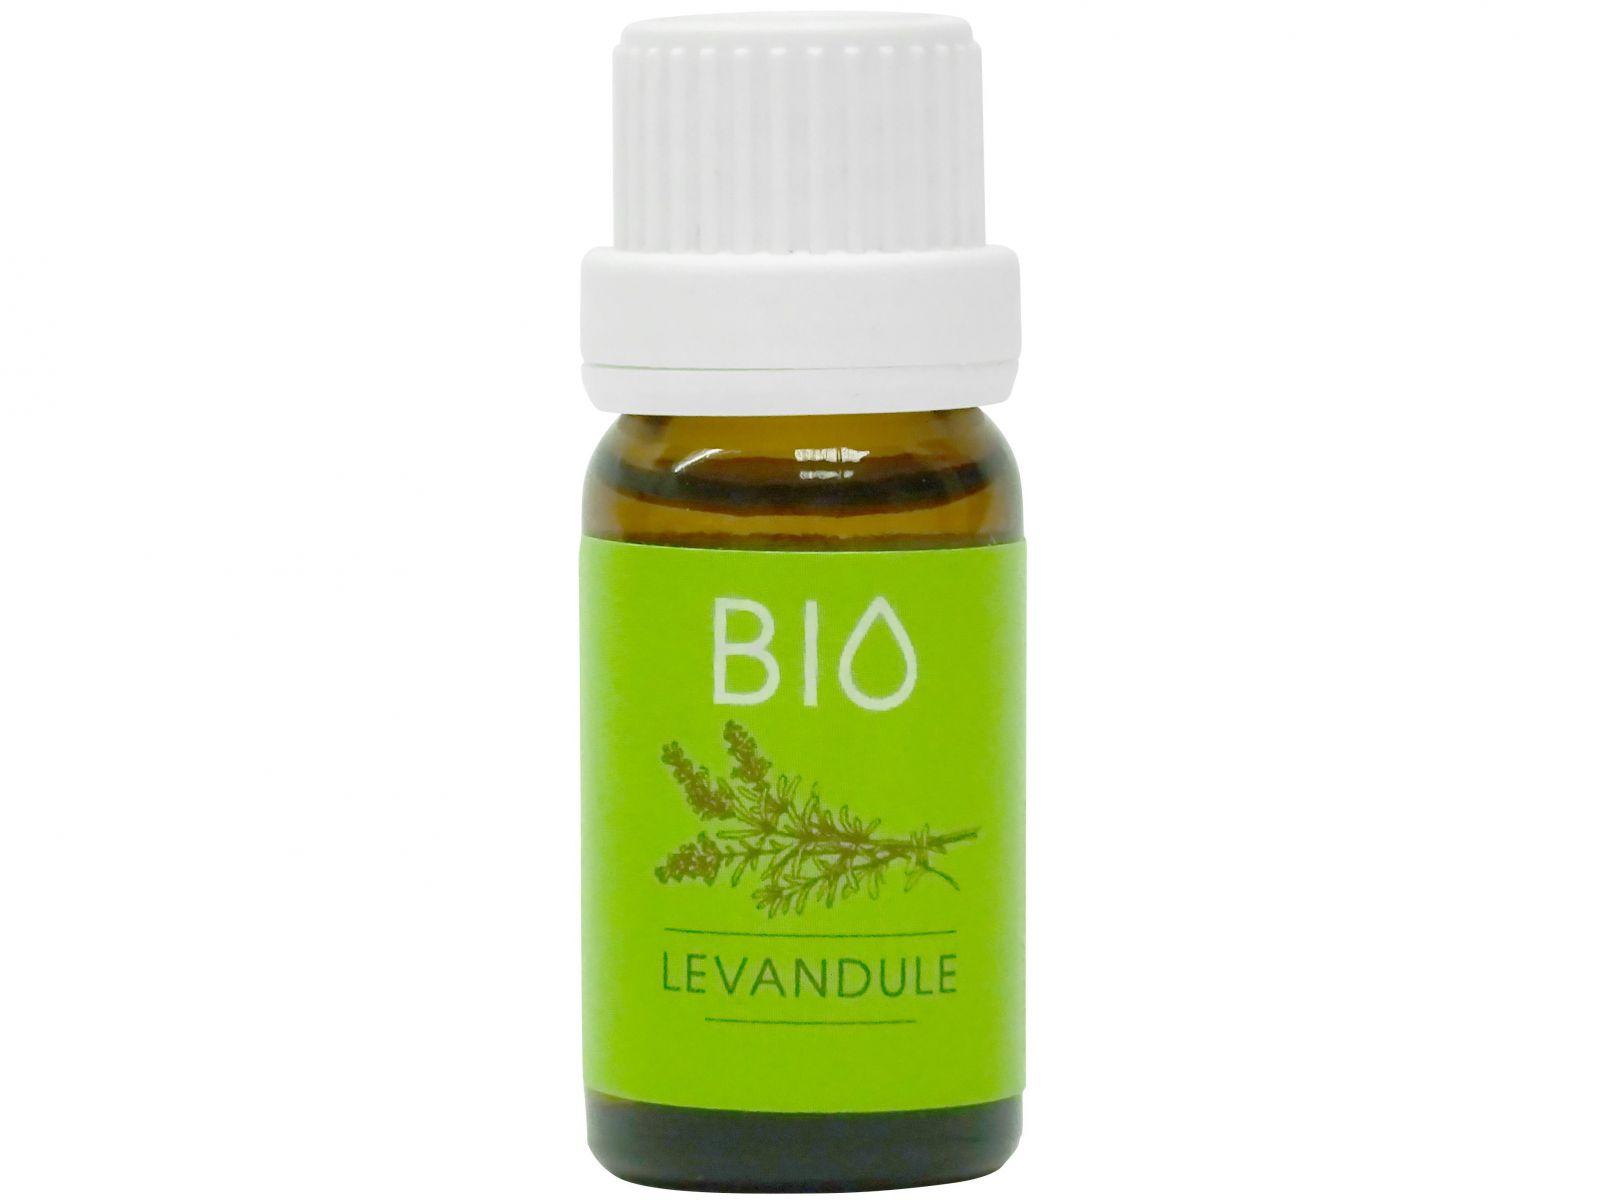 Hanscraft 100% BIO esenciální vonný olej - 11ml BIO aroma do saun, infrasaun, aromalamp, odpařovačů a difuzérů - Levandule (LEVANDULA ANGUSTIFOLIA)